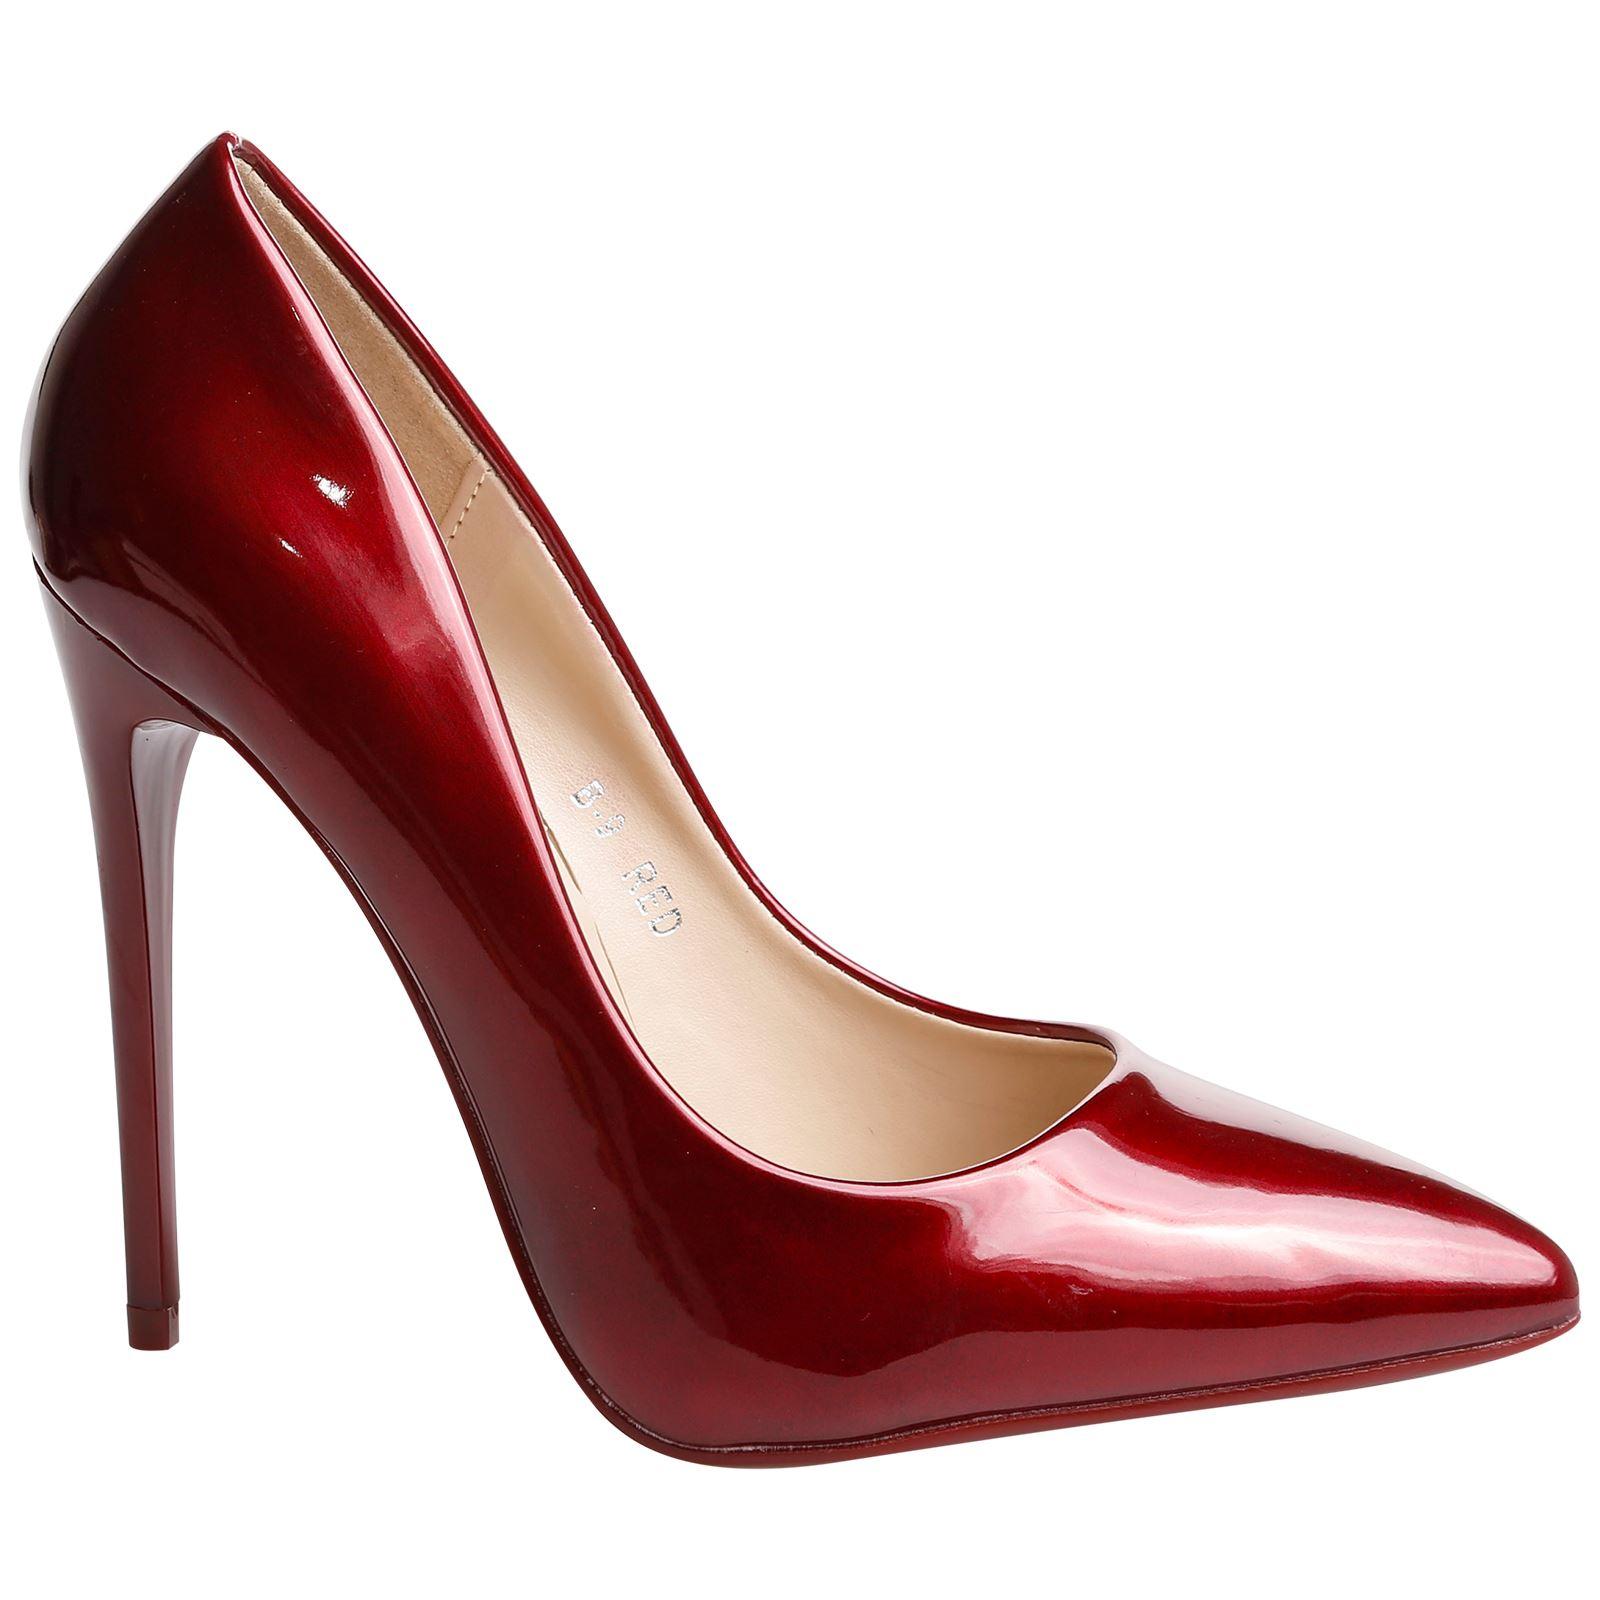 Danita Womens Stilettos High Heels Pointed Toe Court Shoes ...